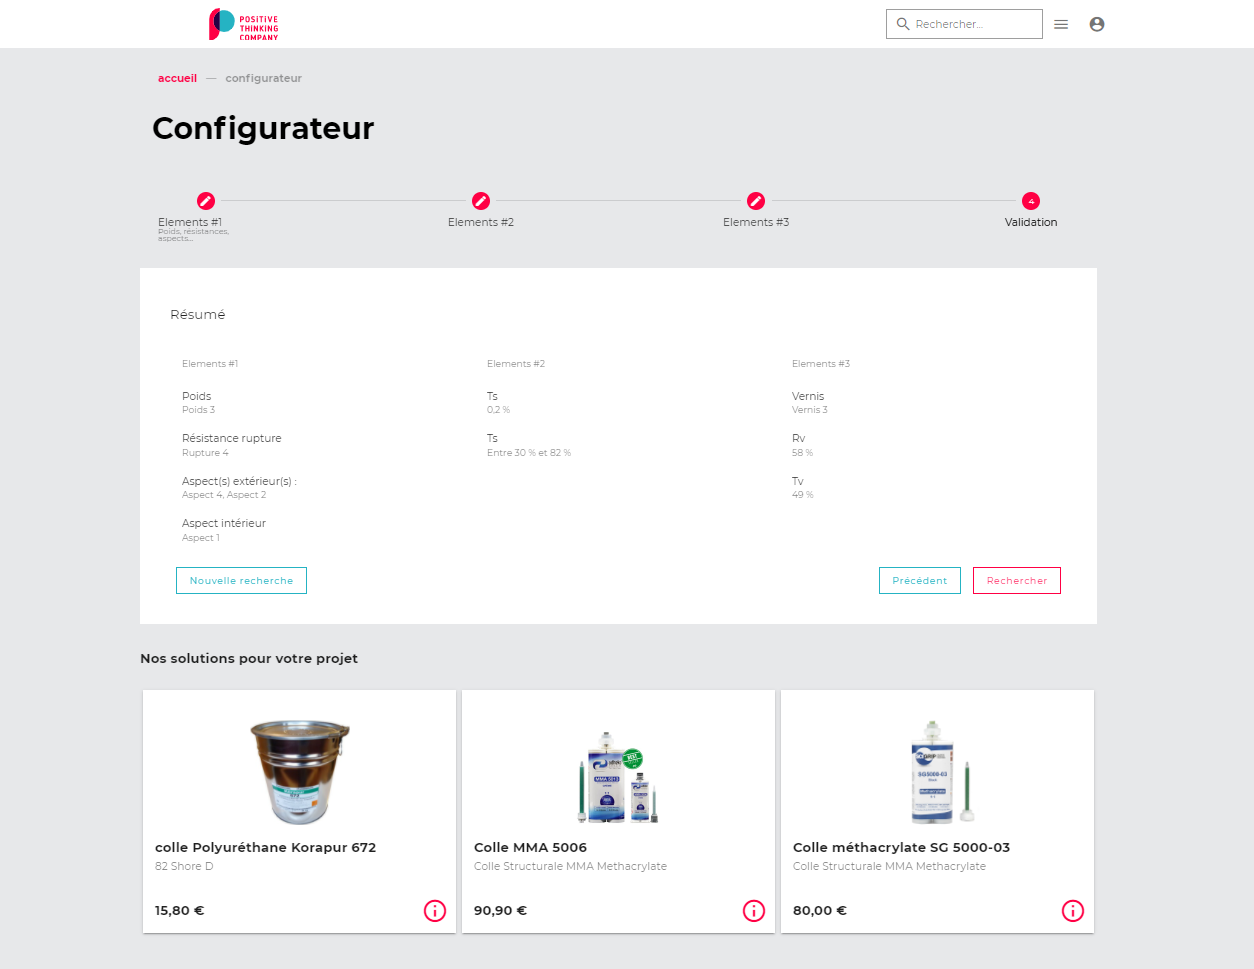 ptc_customer_platform_configurateur-1